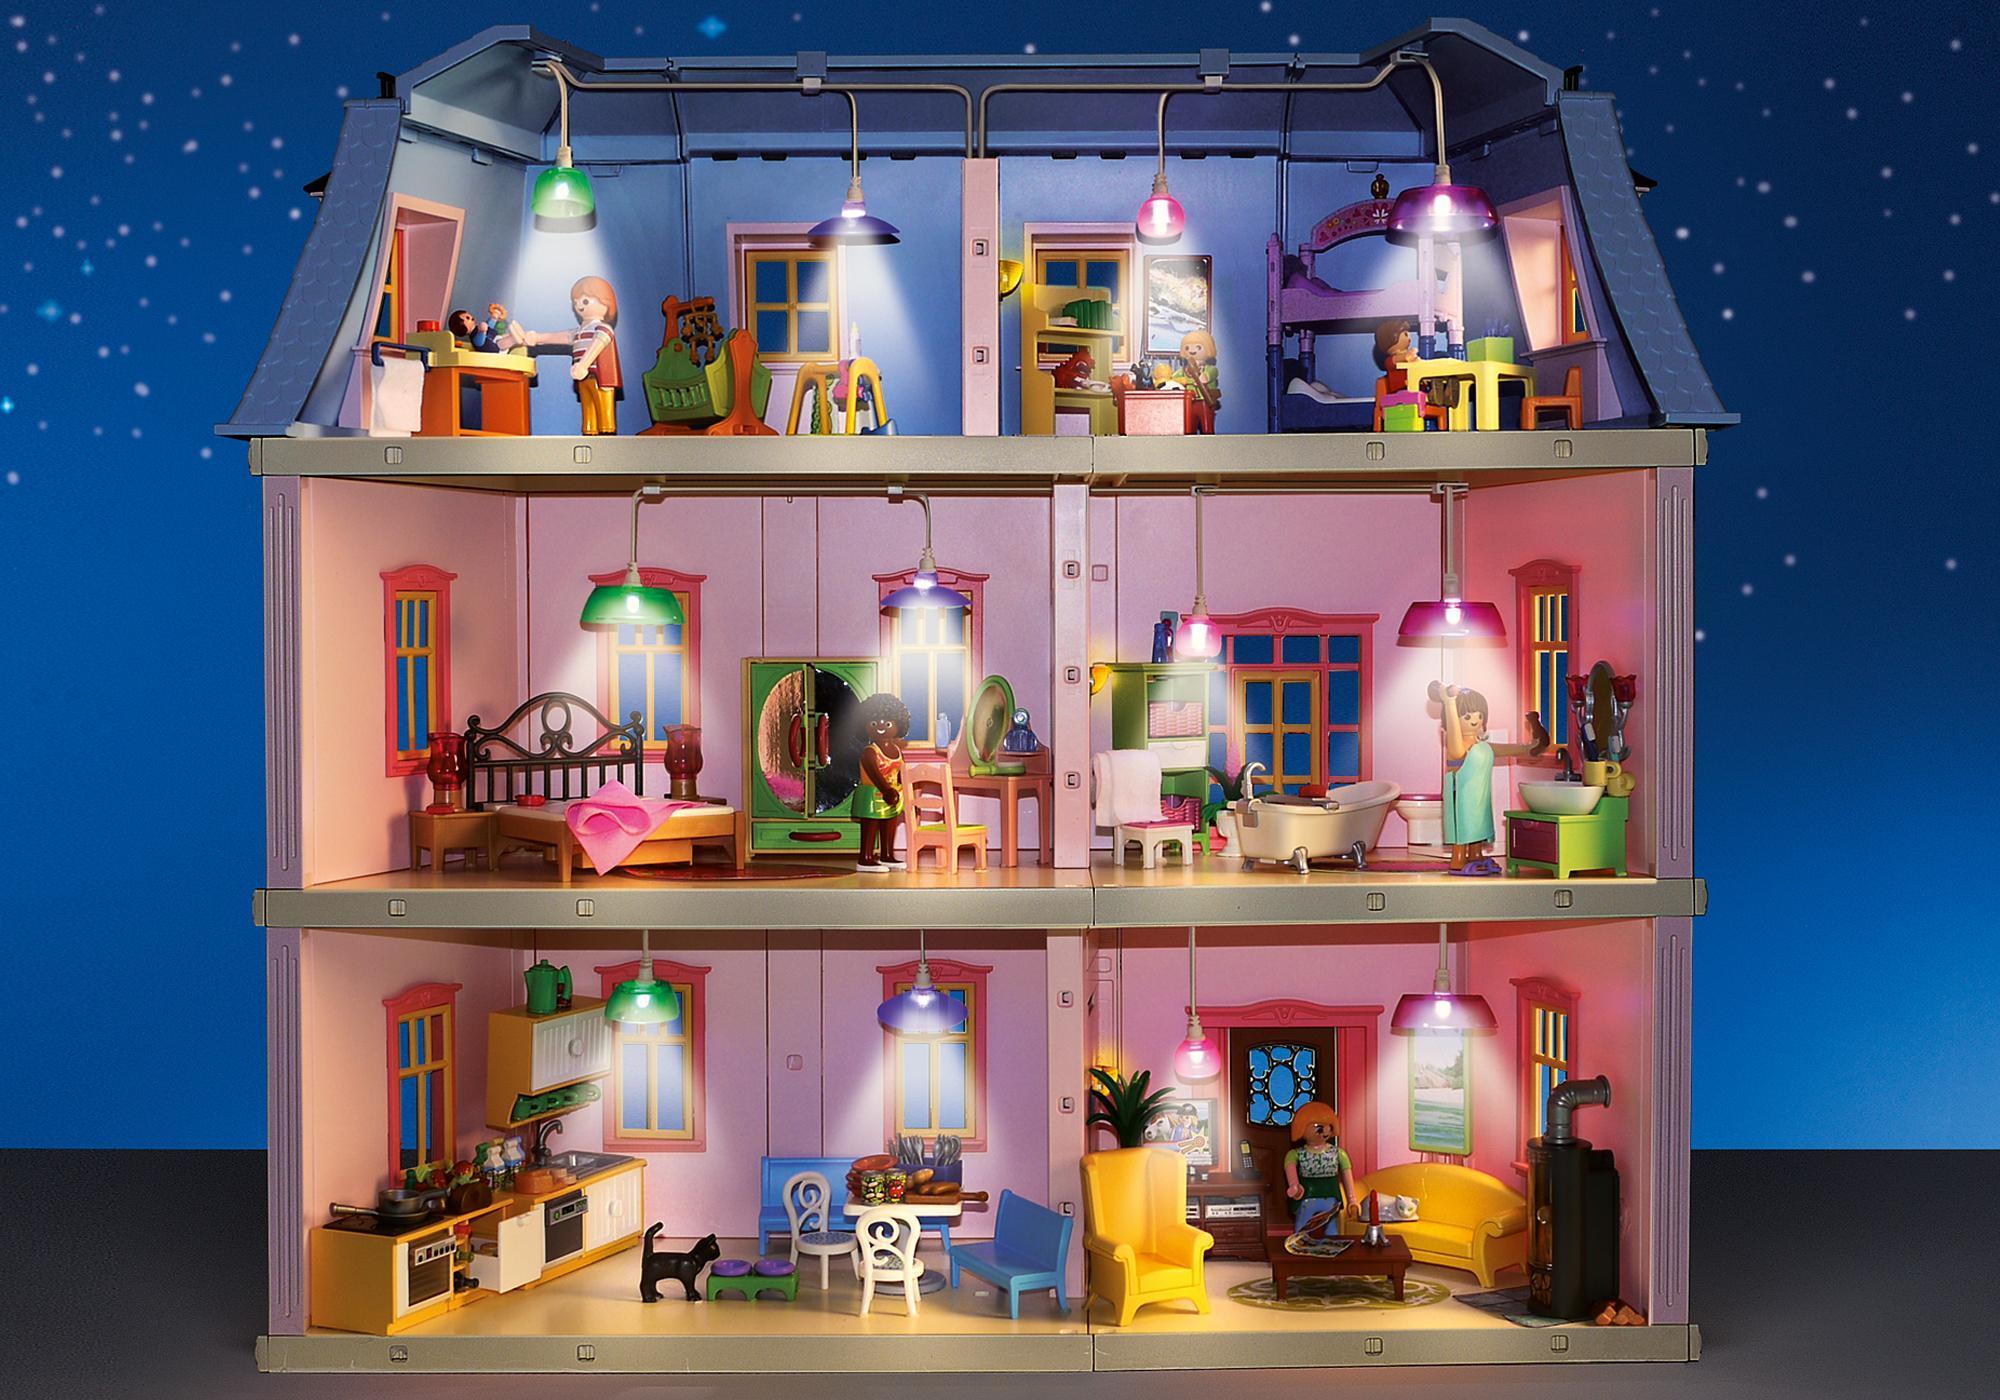 http://media.playmobil.com/i/playmobil/6456_product_extra1/Light Set for Deluxe Dollhouse (5303)